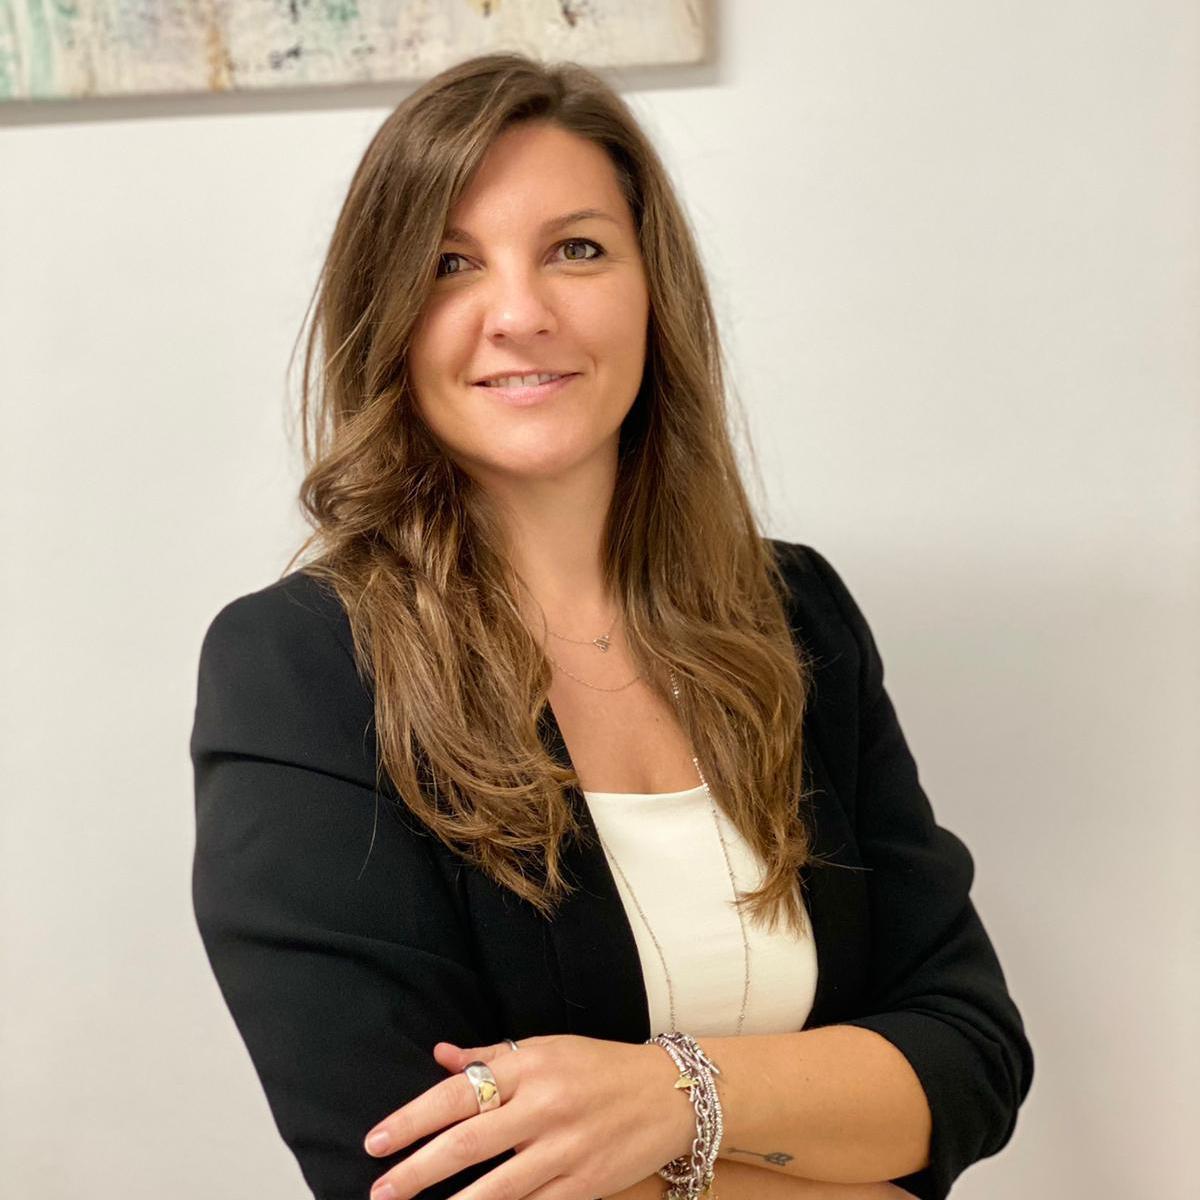 Francesca Corvi